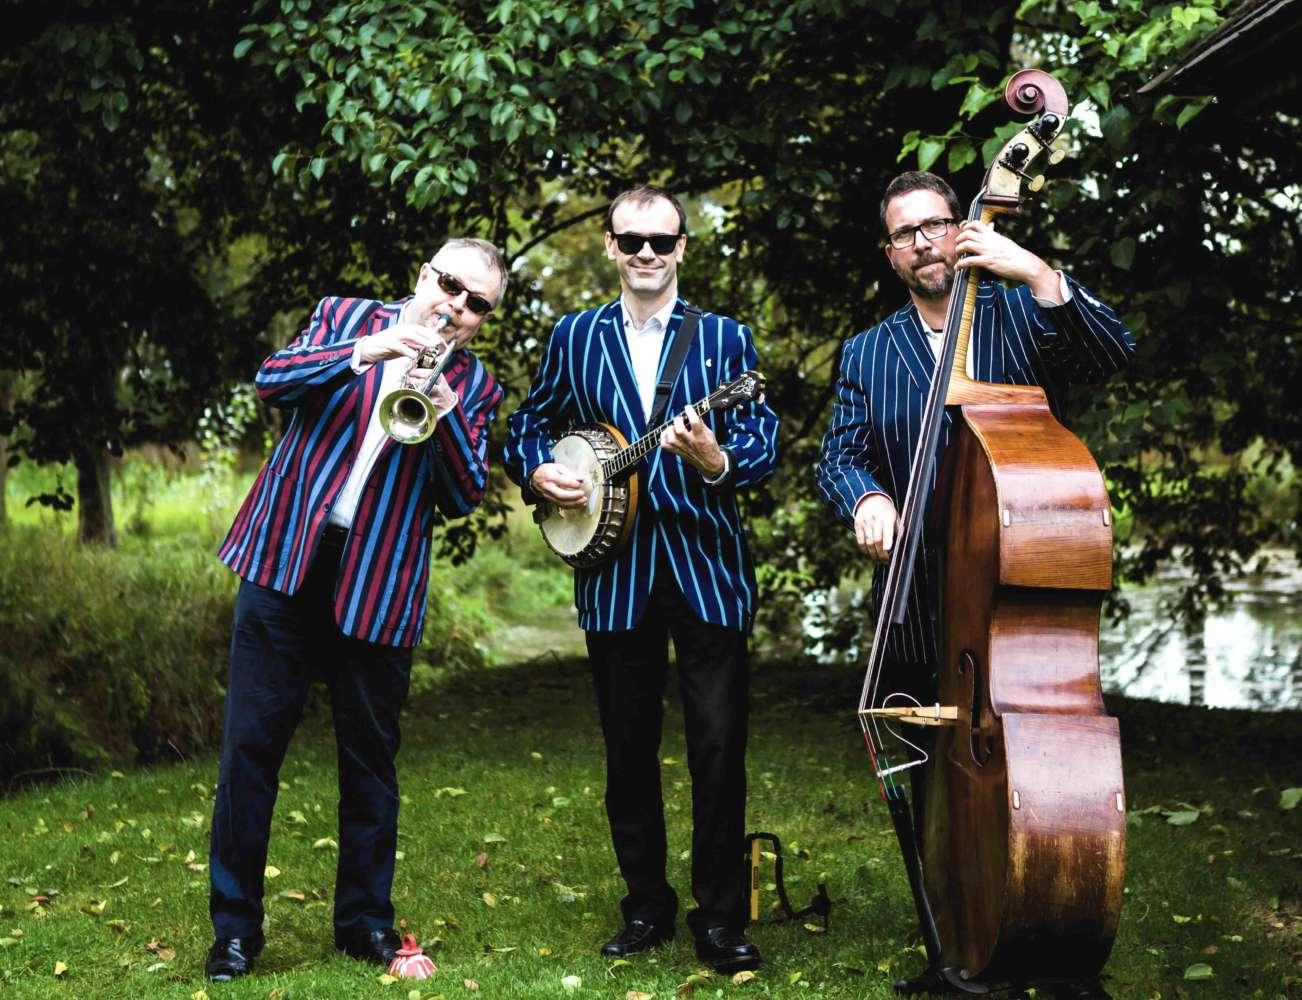 12Th Street Swingers Dixieland Band London Main